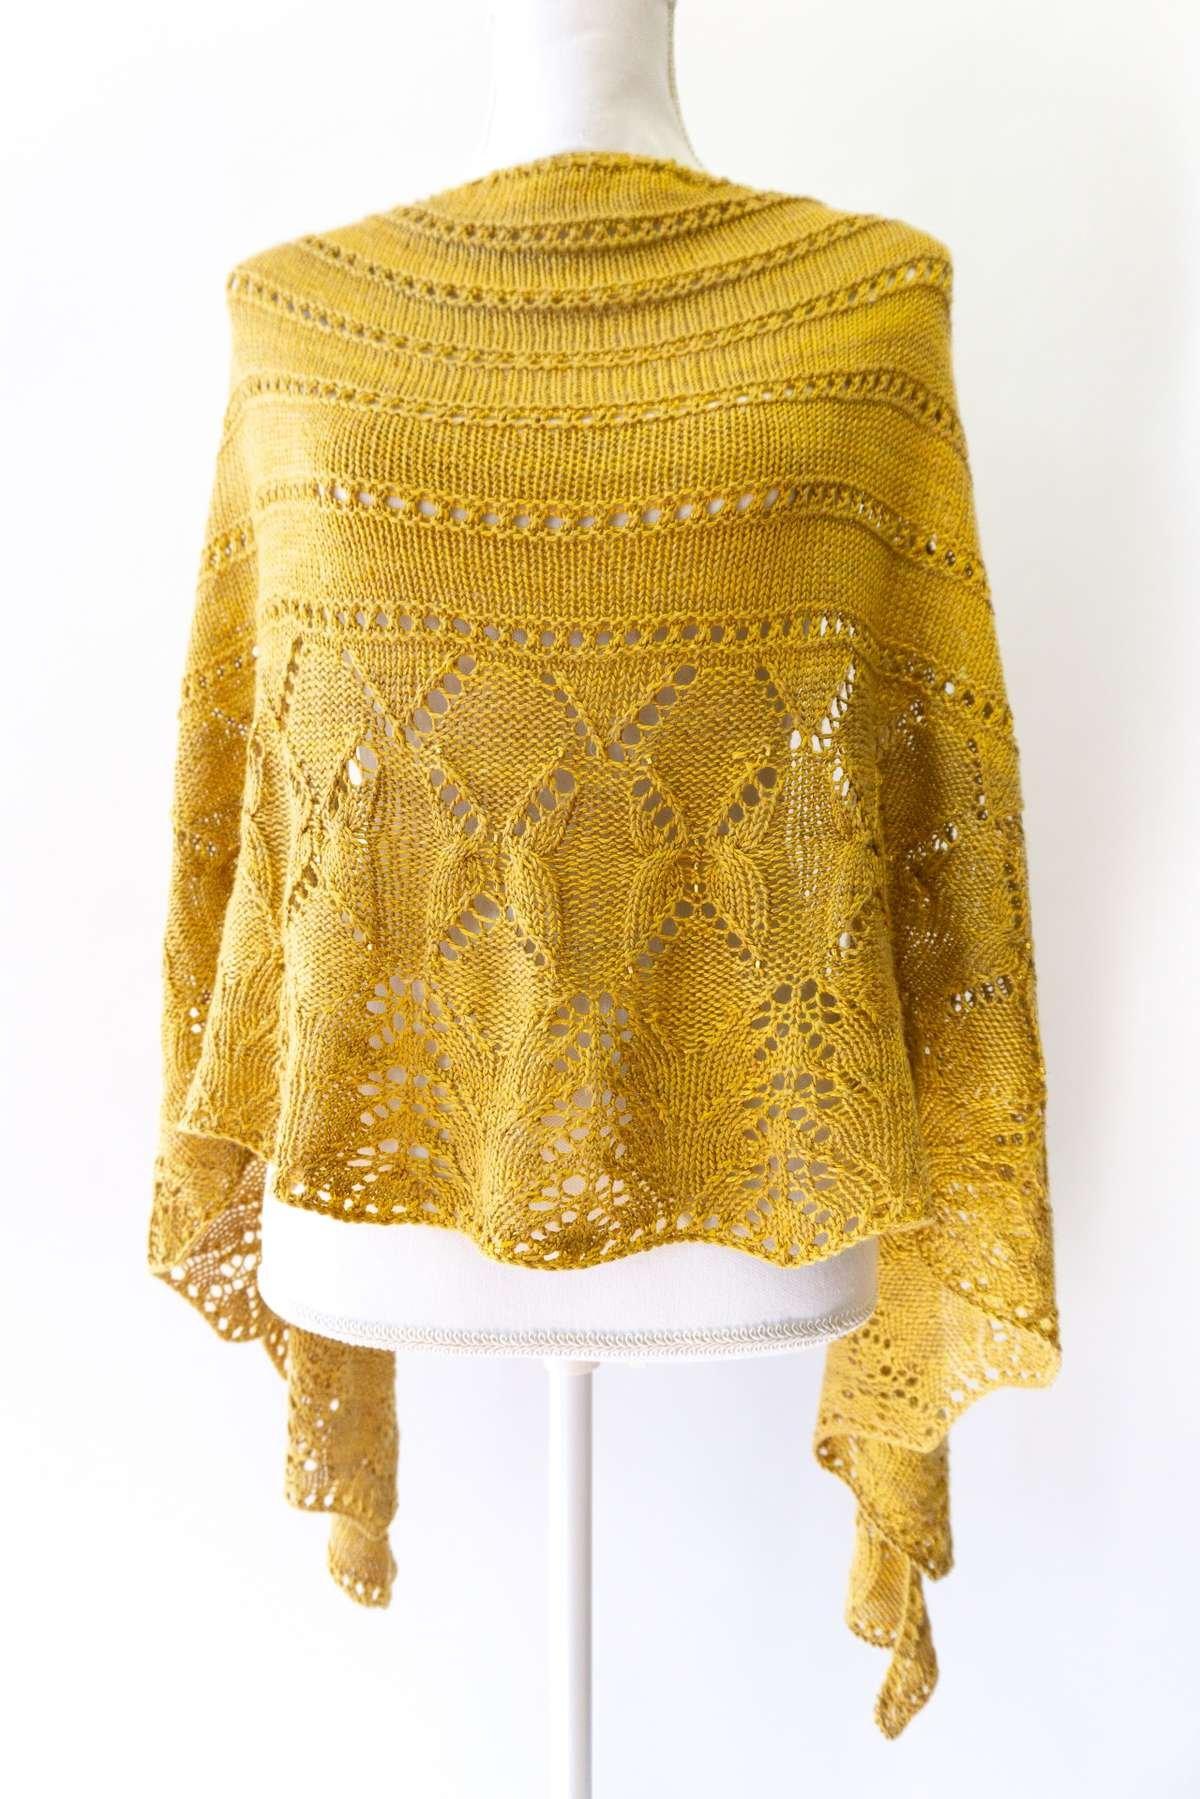 Gift for knitters - Shawl knitting kit